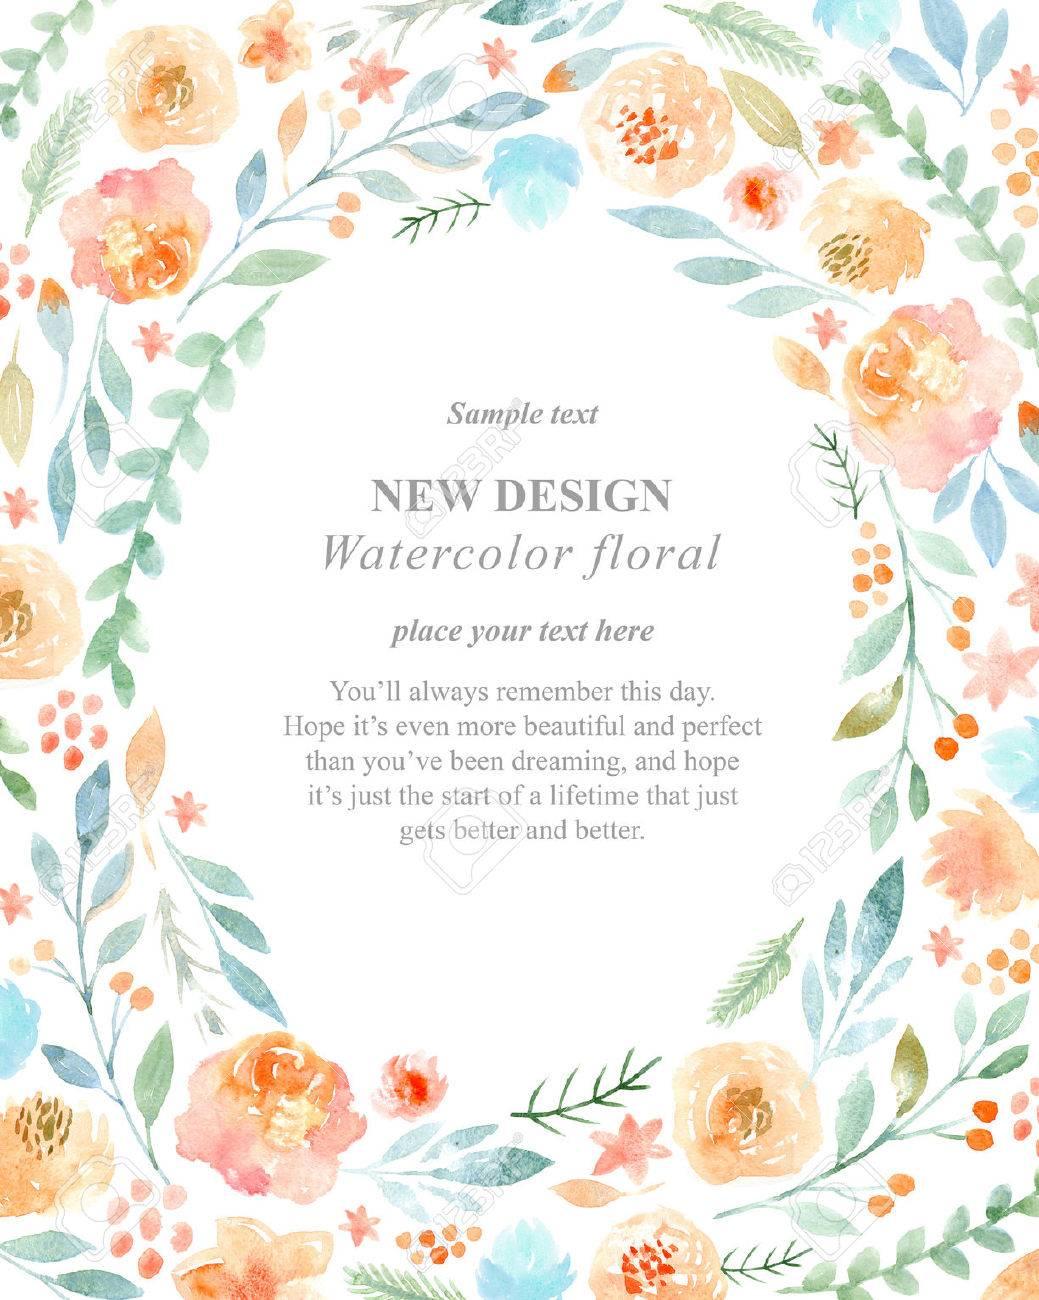 watercolor flowers - 47111140